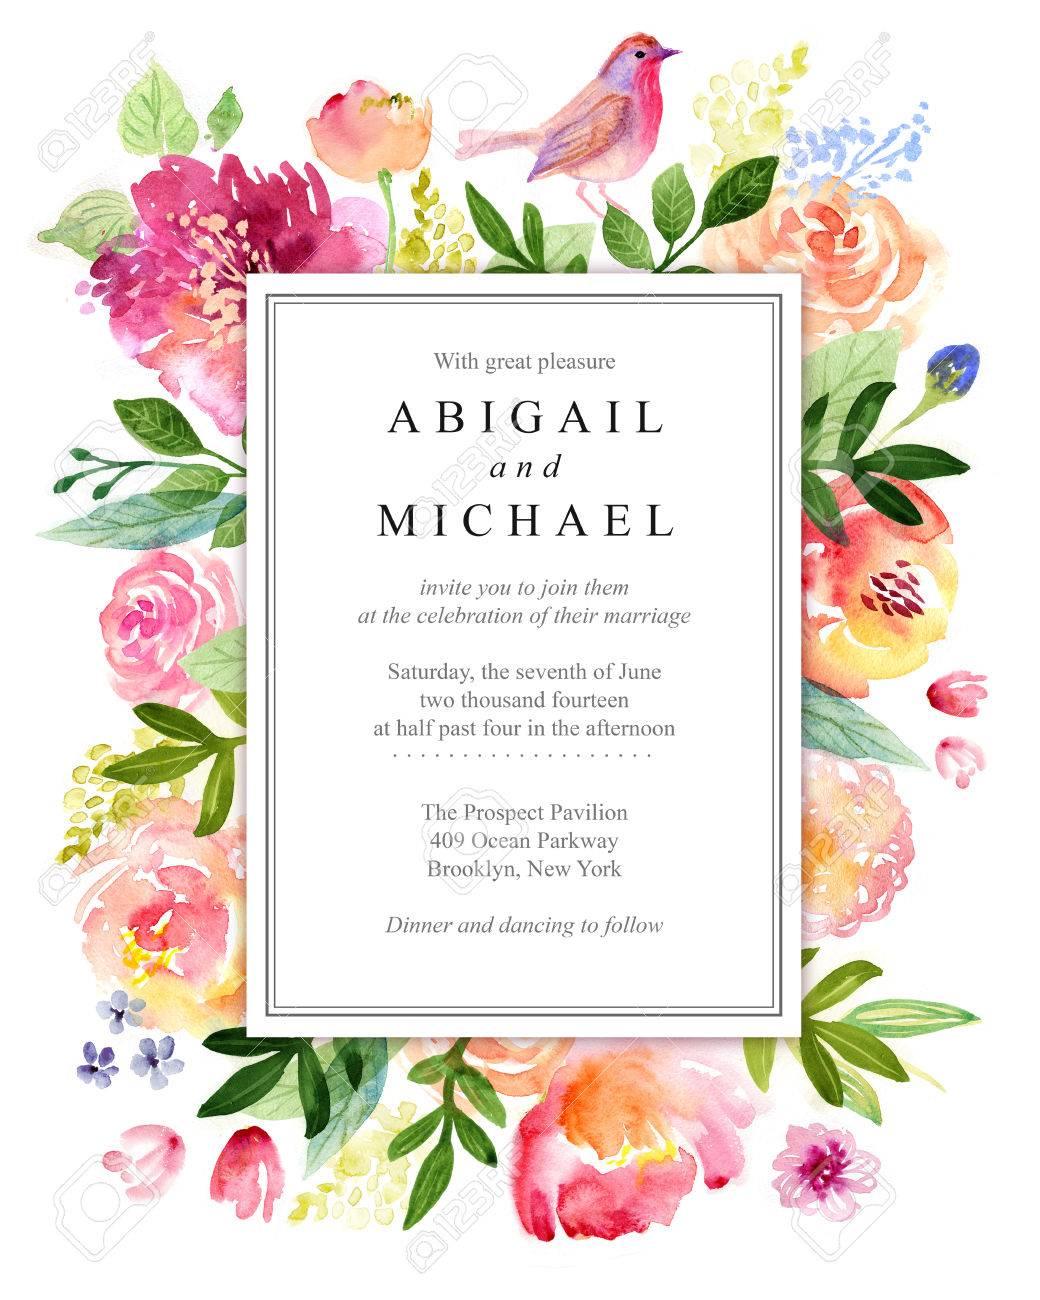 Watercolor floral greeting card. Flowers roses. Handmade. Vintage background - 65587977